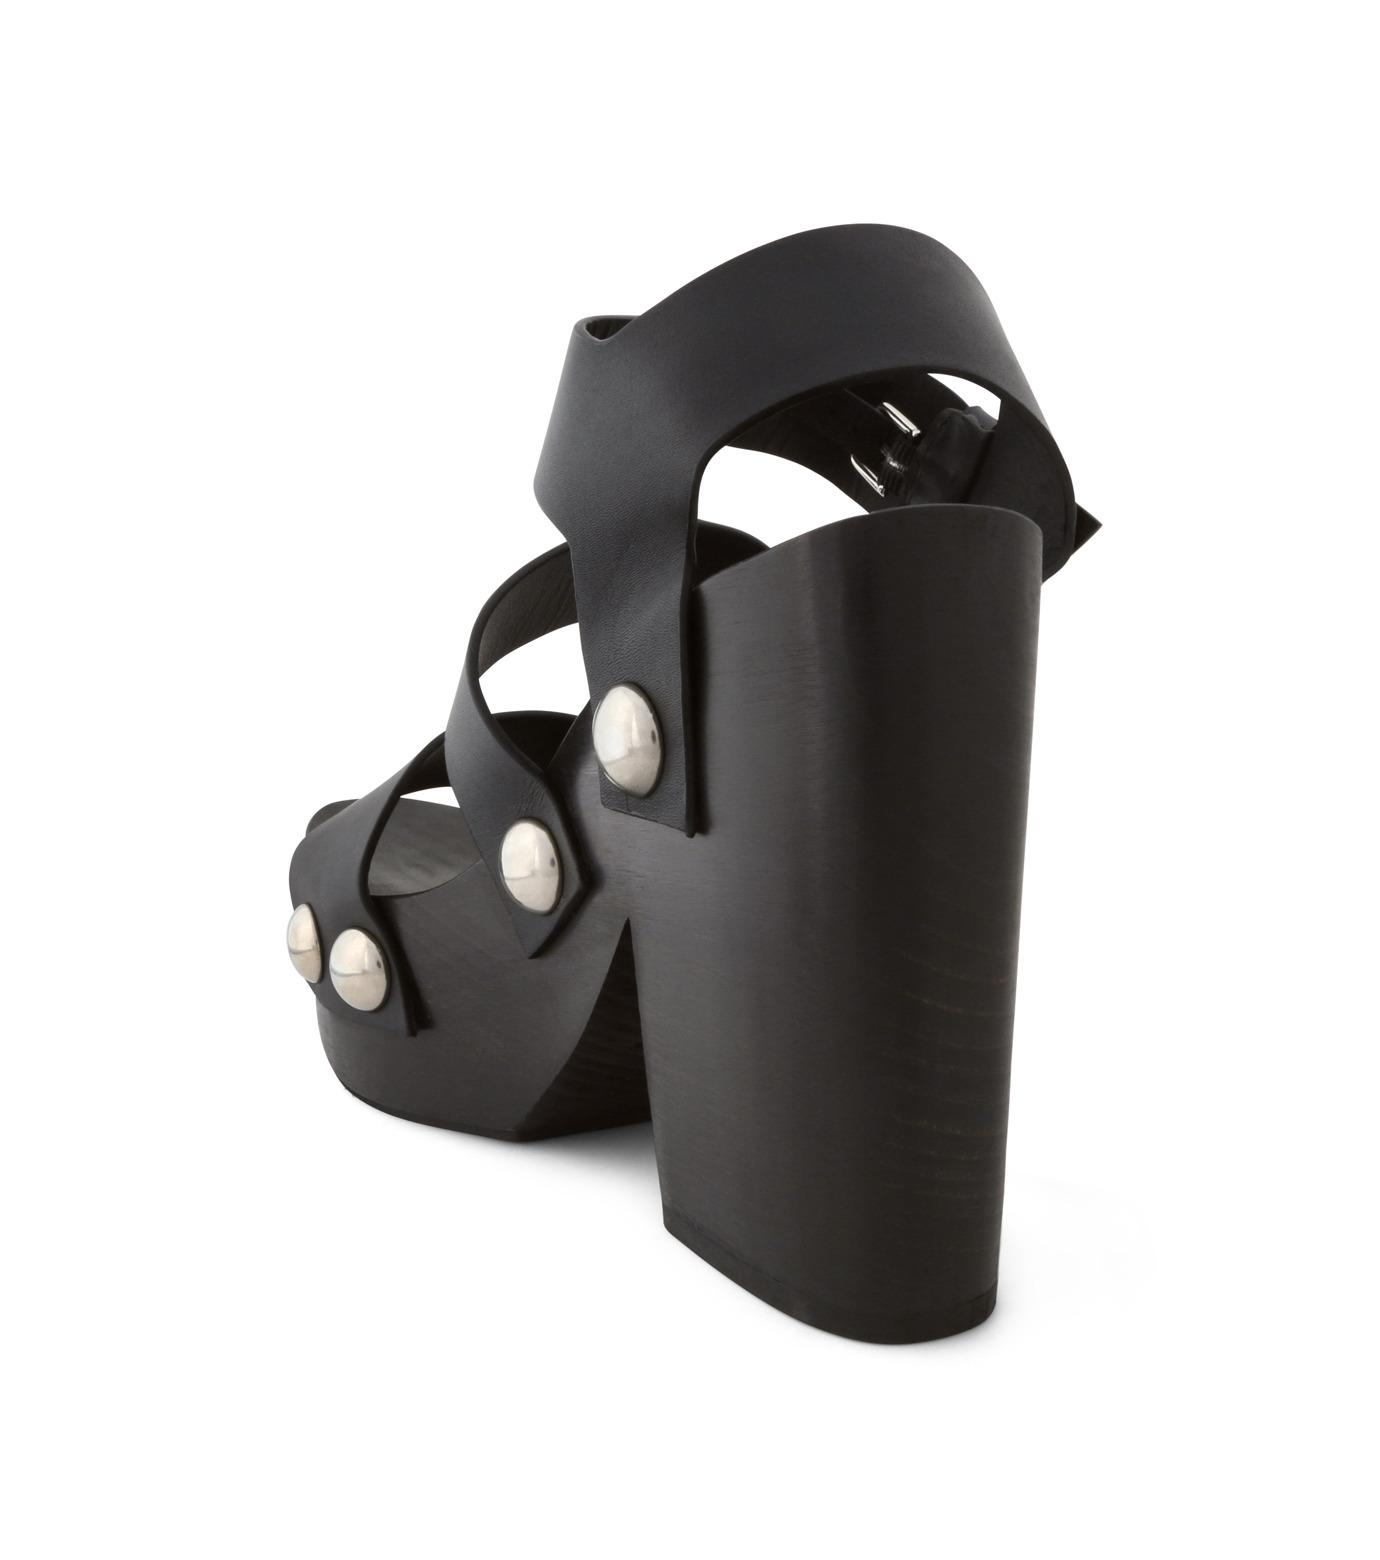 Alexander Wang(アレキサンダーワン)のTess Wooden Platform Sandal-BLACK(シューズ/shoes)-304132P16-13 拡大詳細画像2